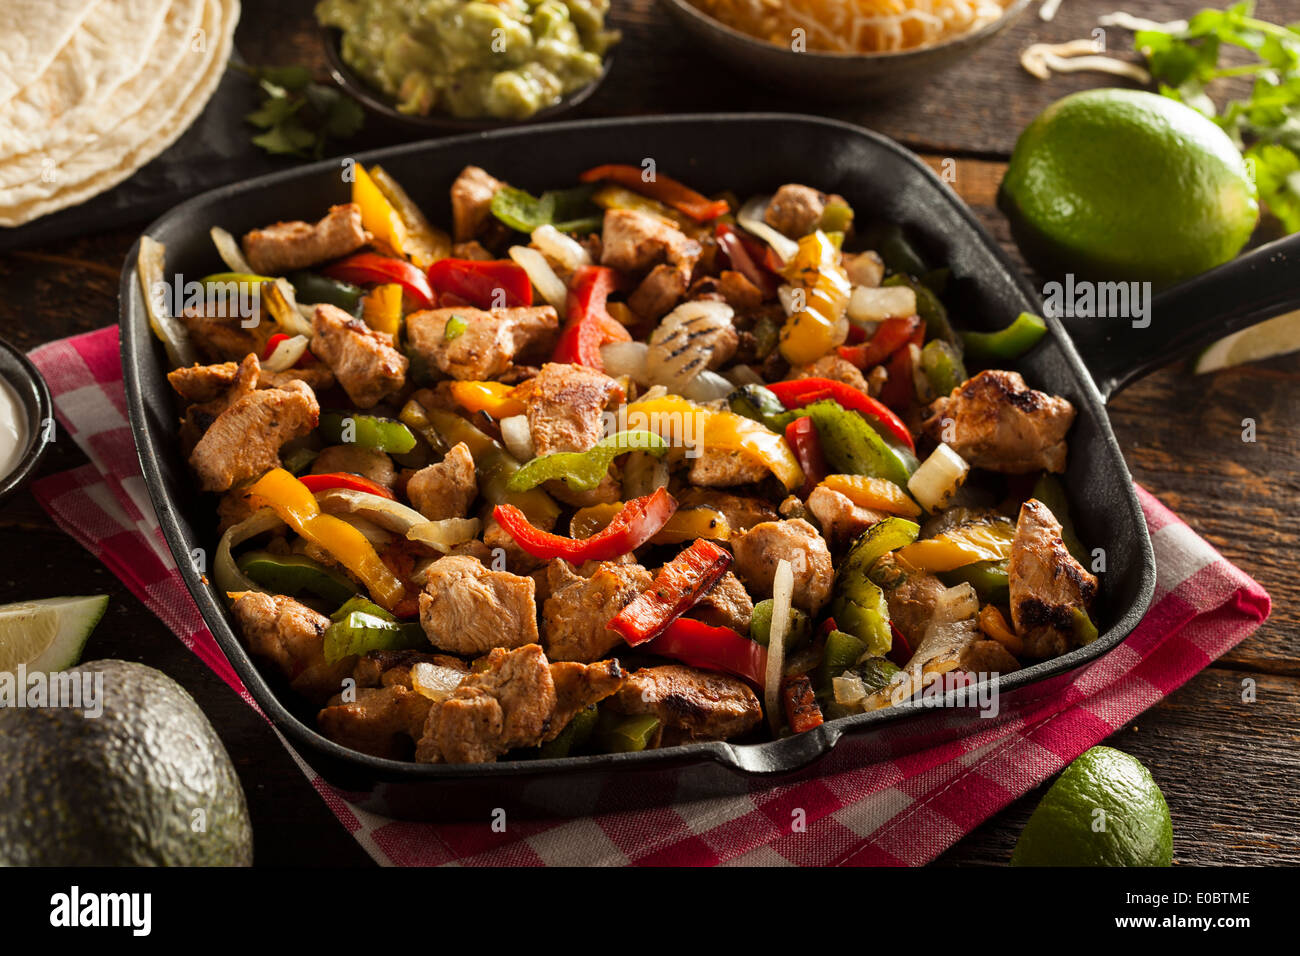 Homemade Chicken Fajitas Banque D Image Et Photos Alamy